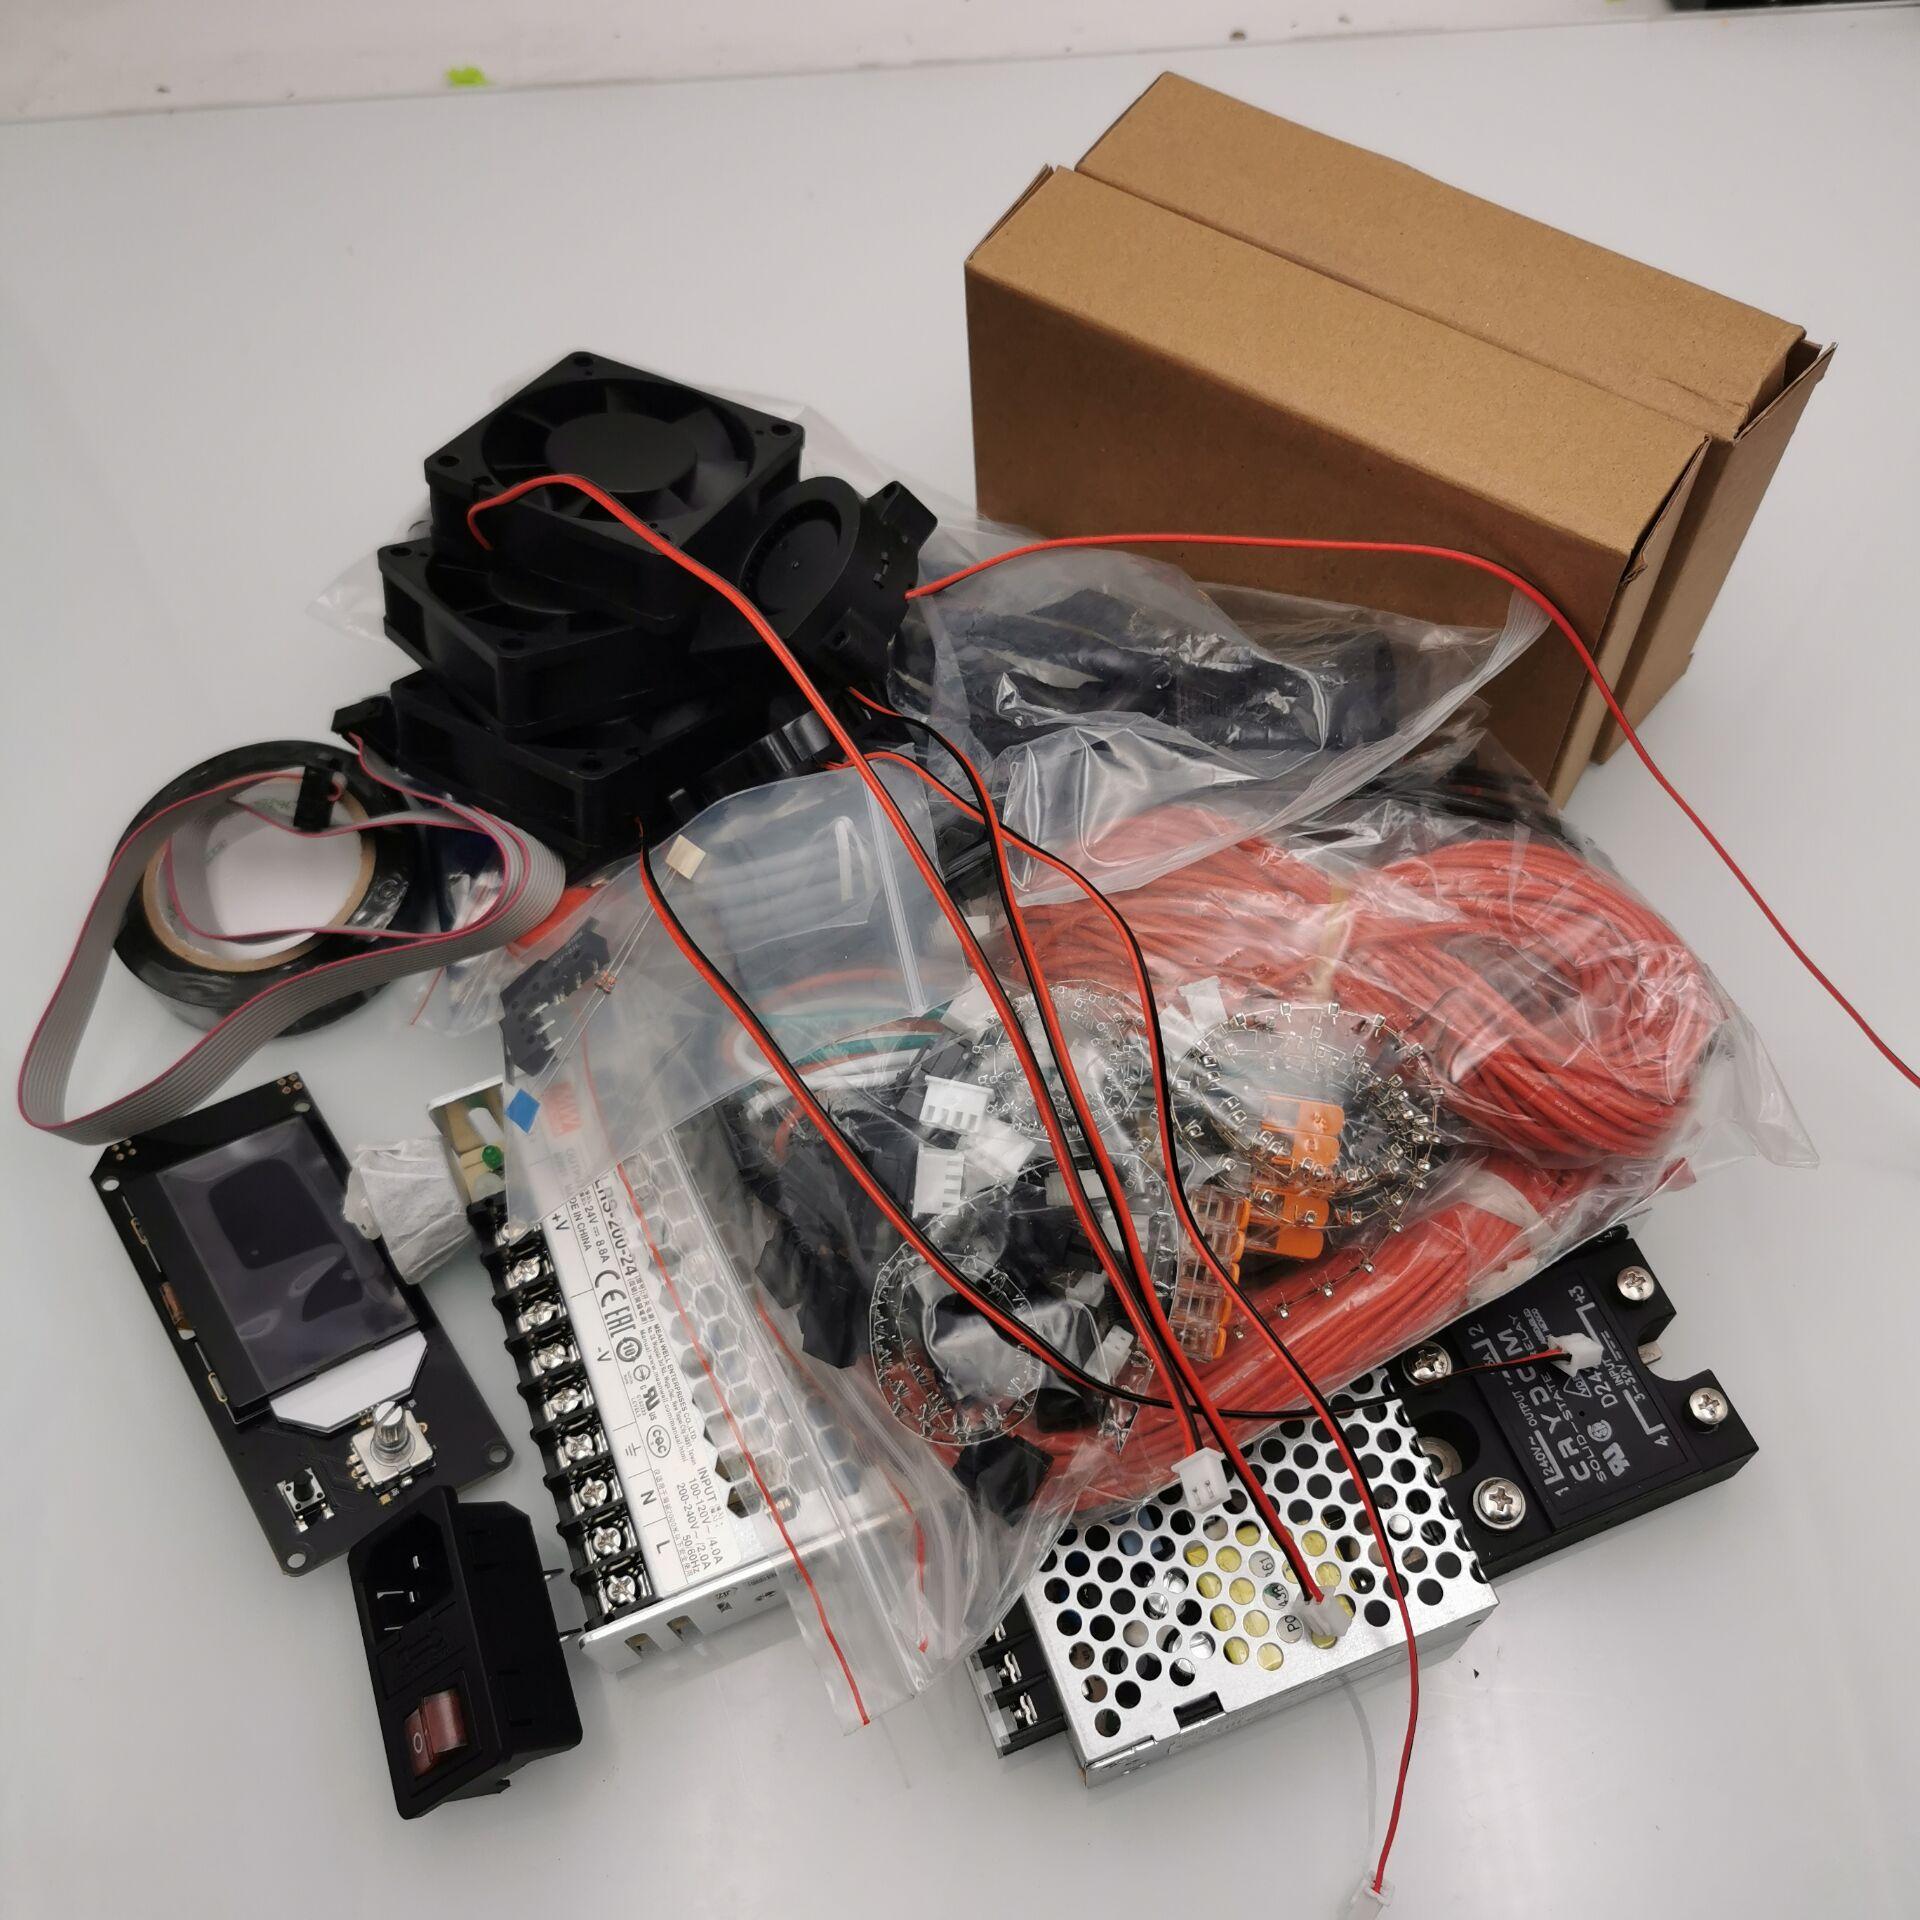 VORON-طابعة ثلاثية الأبعاد SKR1.3 SKR1.4 ، مجموعة أجزاء إلكترونية ، DIY ، Meanwell power TMC2209 ، موصل الاتحاد الأوروبي/الولايات المتحدة ، 2.4